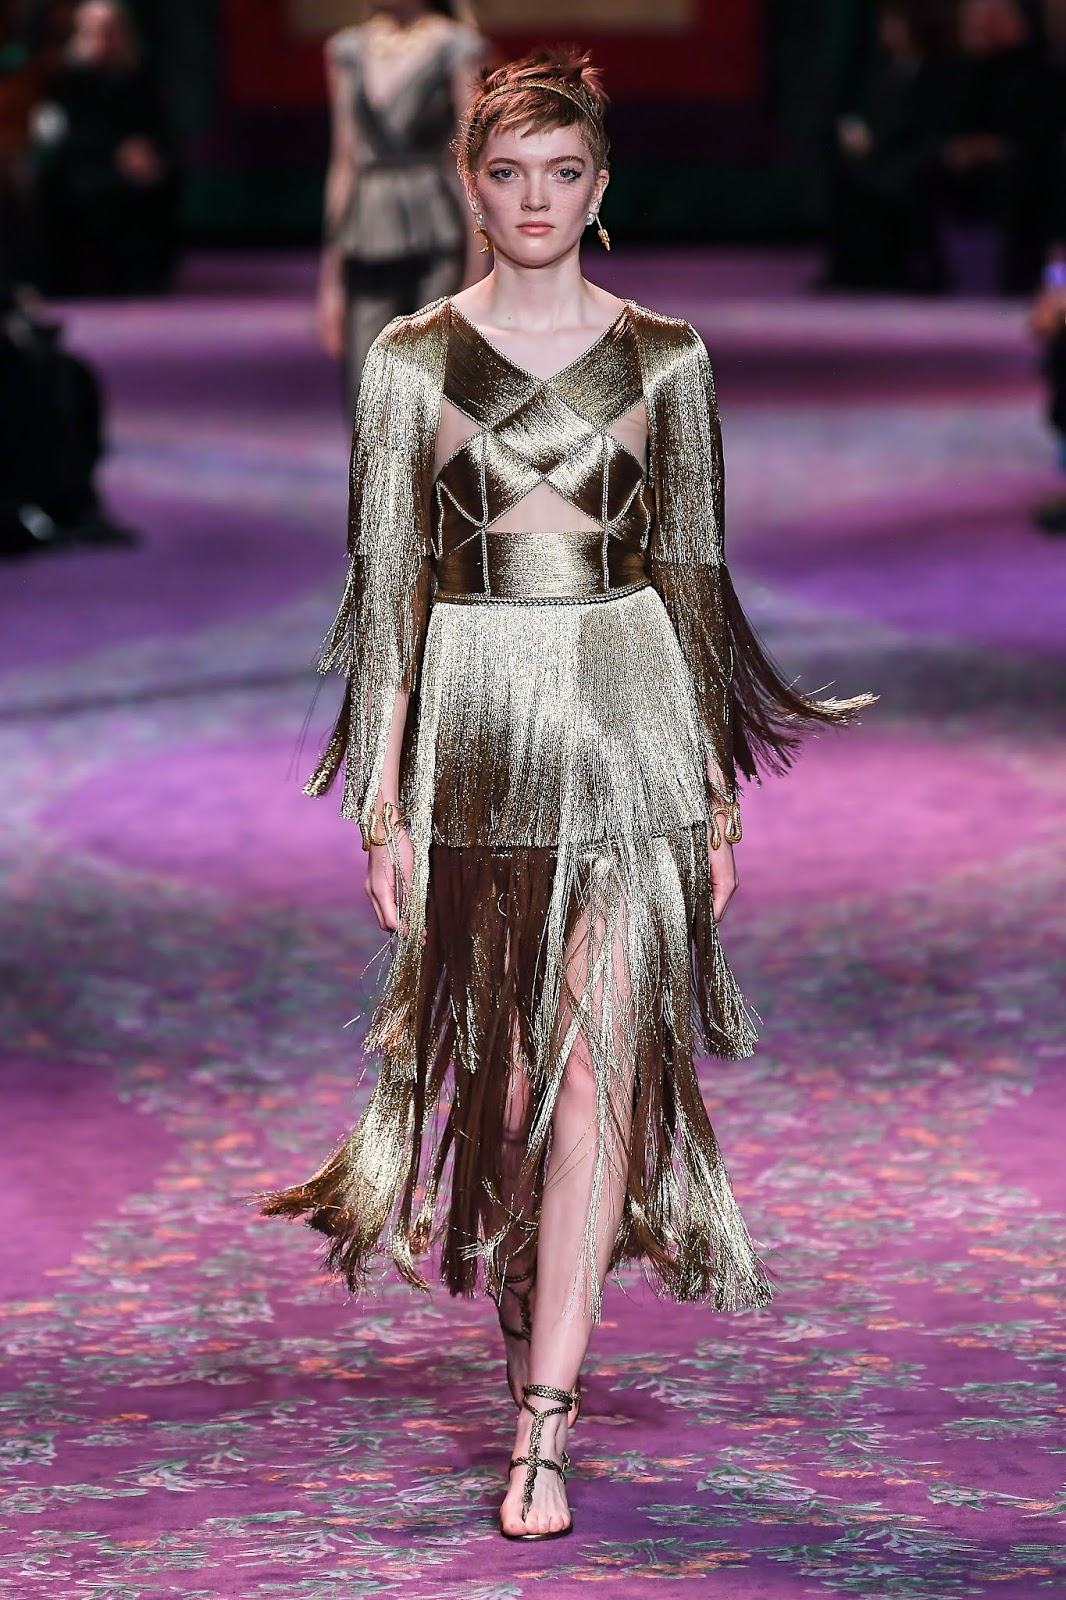 Christian Dior Gorgeous